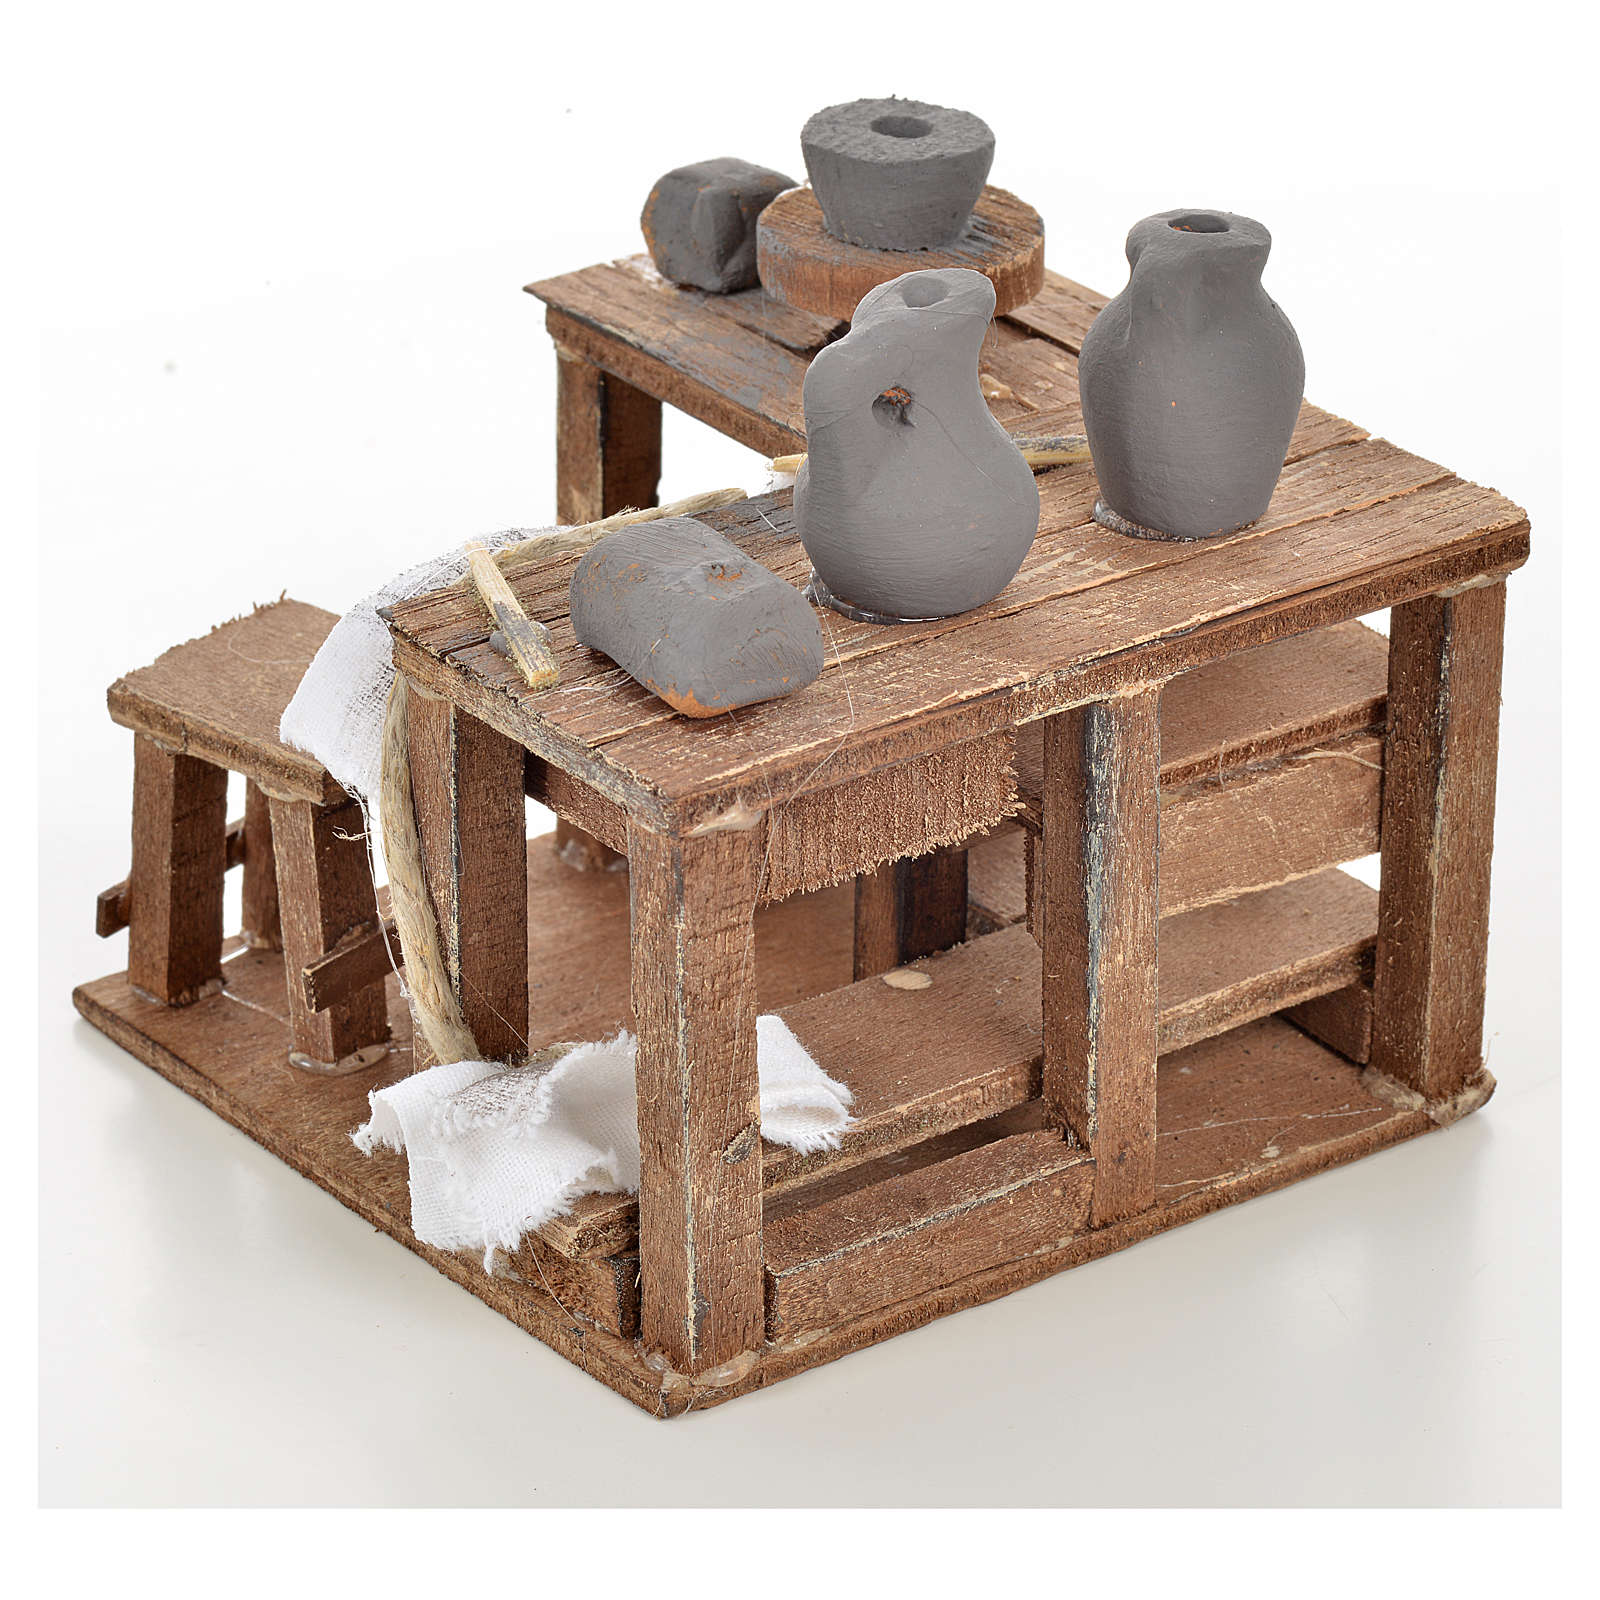 Neapolitan Nativity scene accessory, ceramist's table 9x9x6cm 4